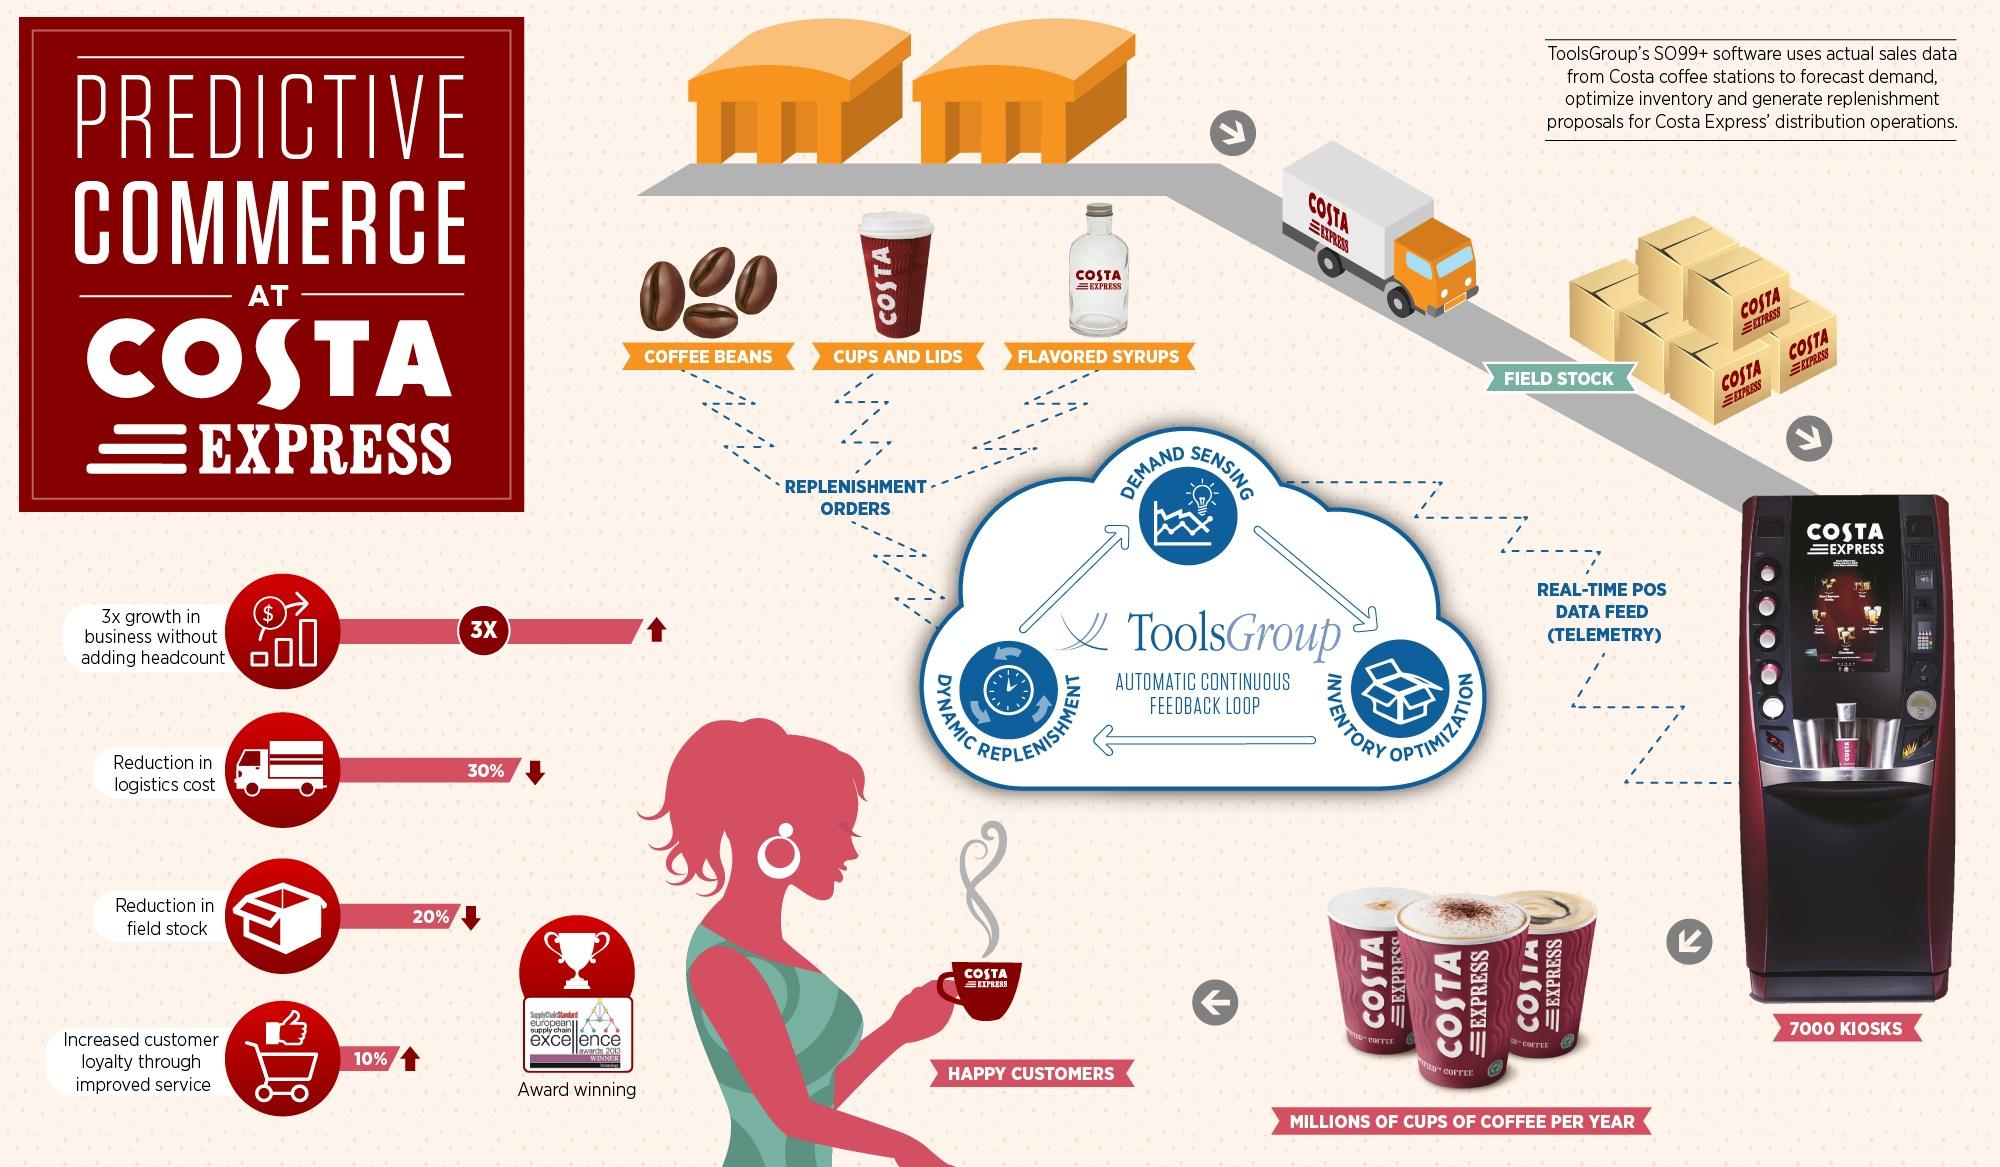 Costa_Express_Infographic_7-14_JPG.jpg